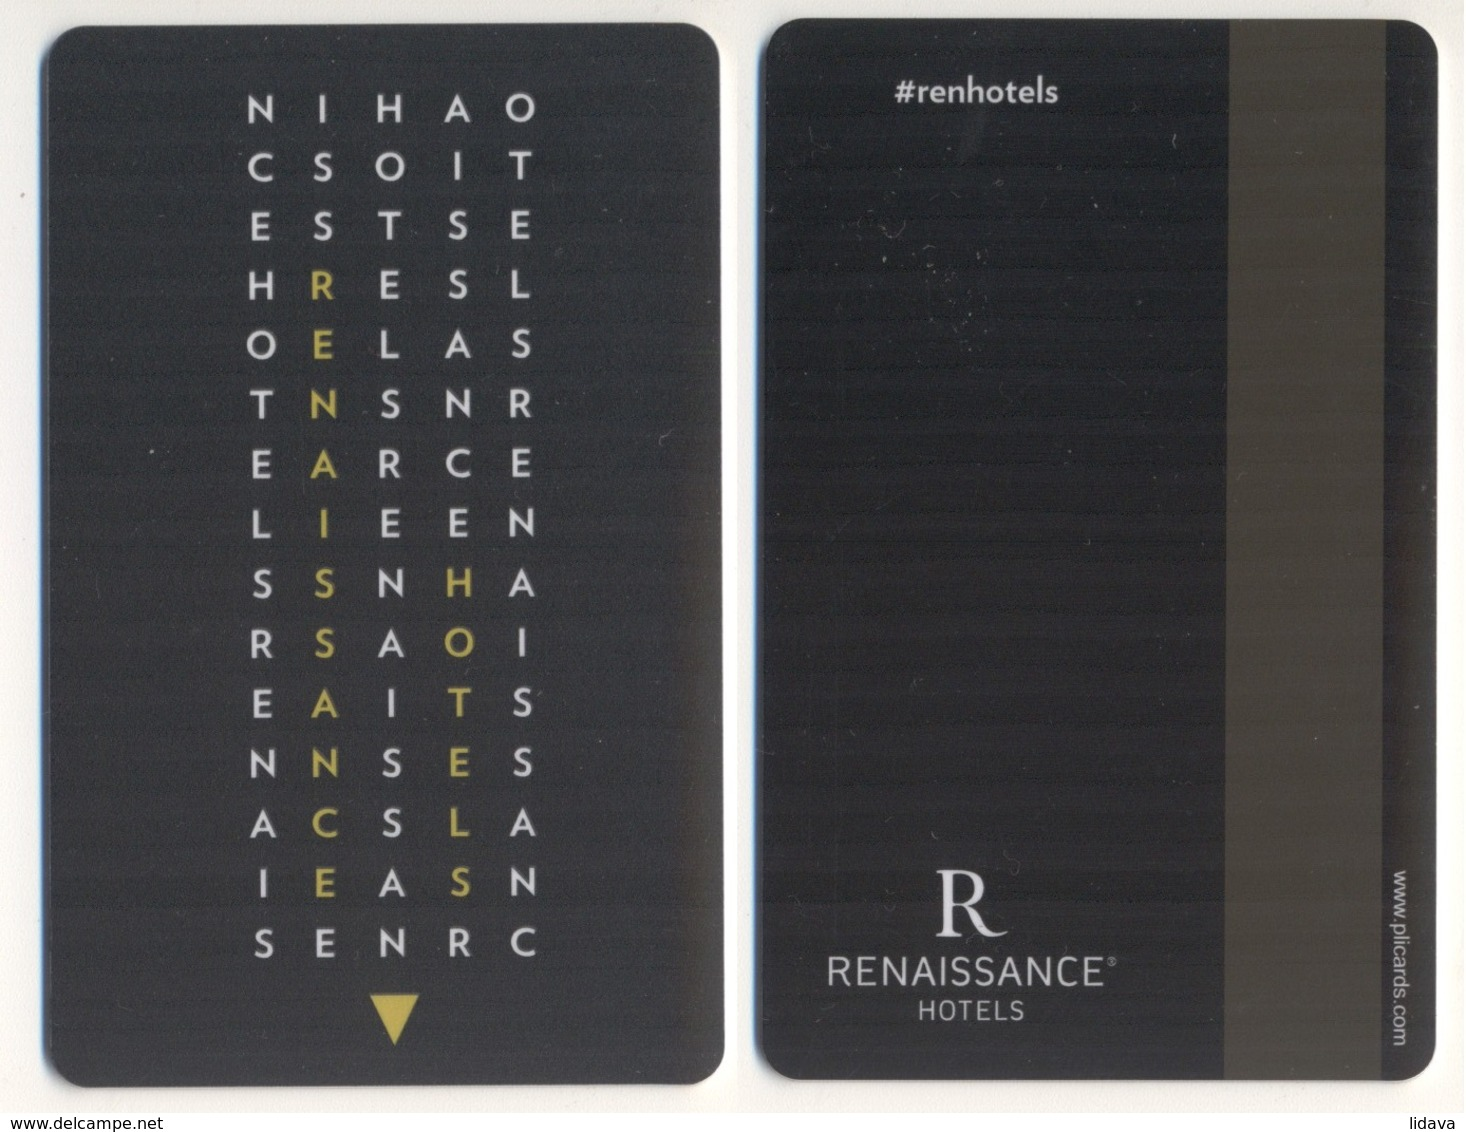 Hotel Key Card RENAISSANCE HOTELS - Chiavi Elettroniche Di Alberghi